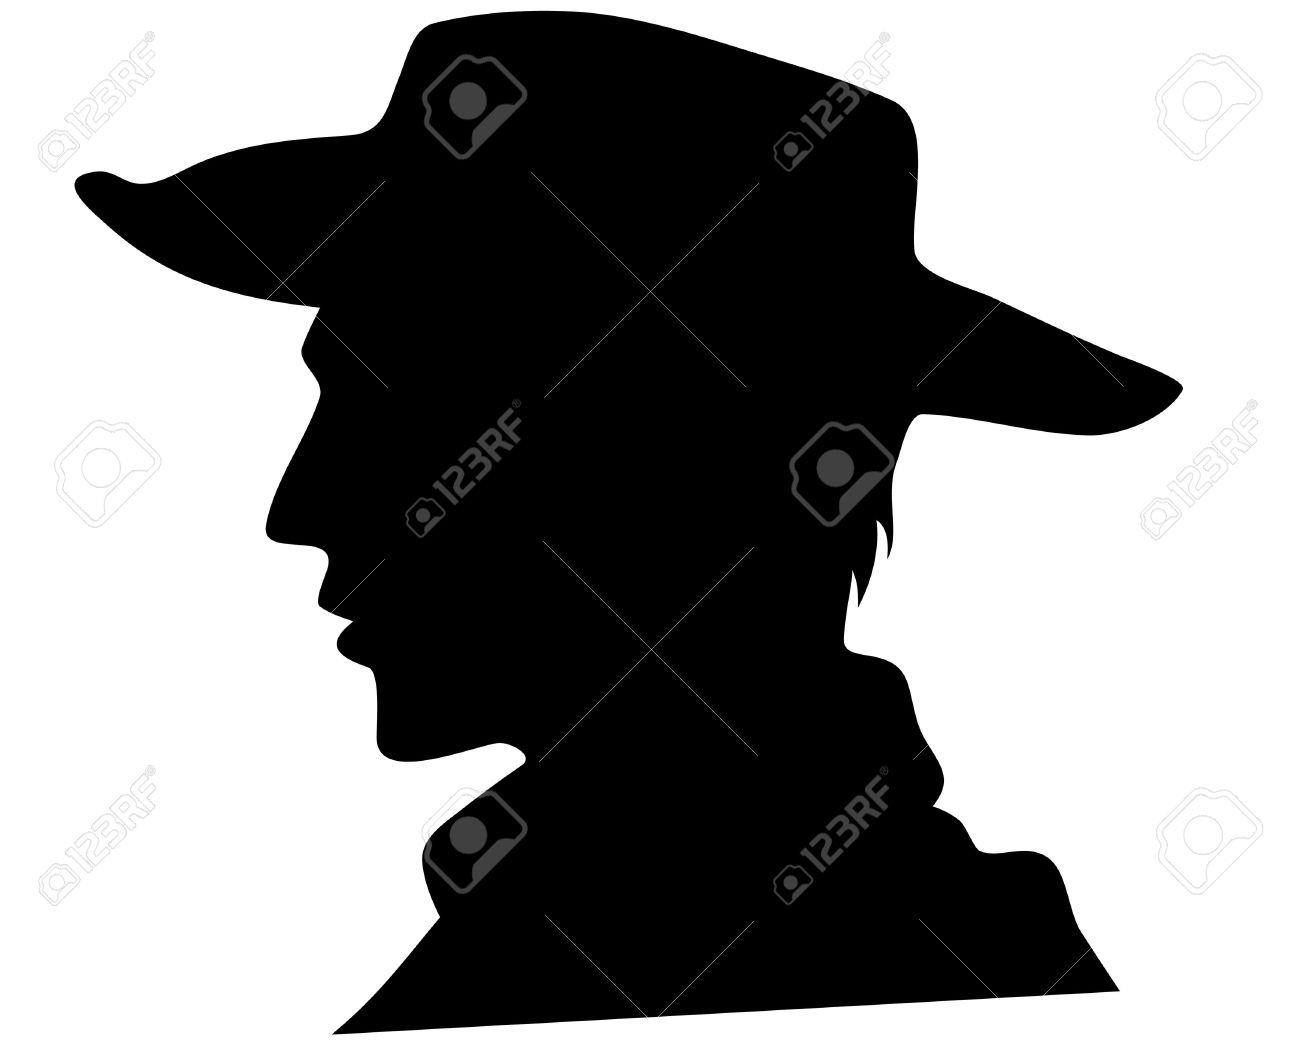 cowboy head illustration - black outline over white Stock Vector - 12957624